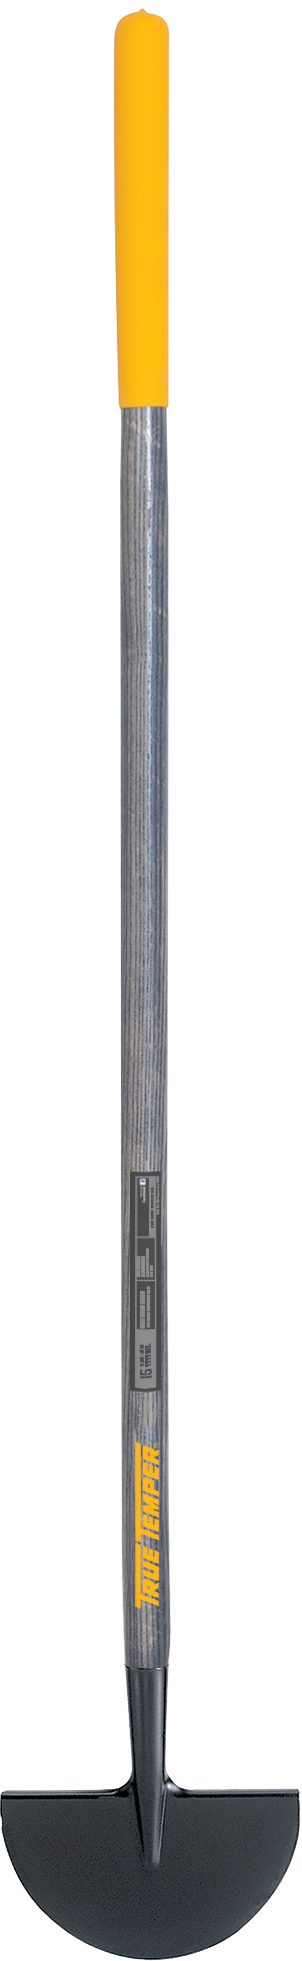 Turf Edger With Cushion Grip On Hardwood Handle True